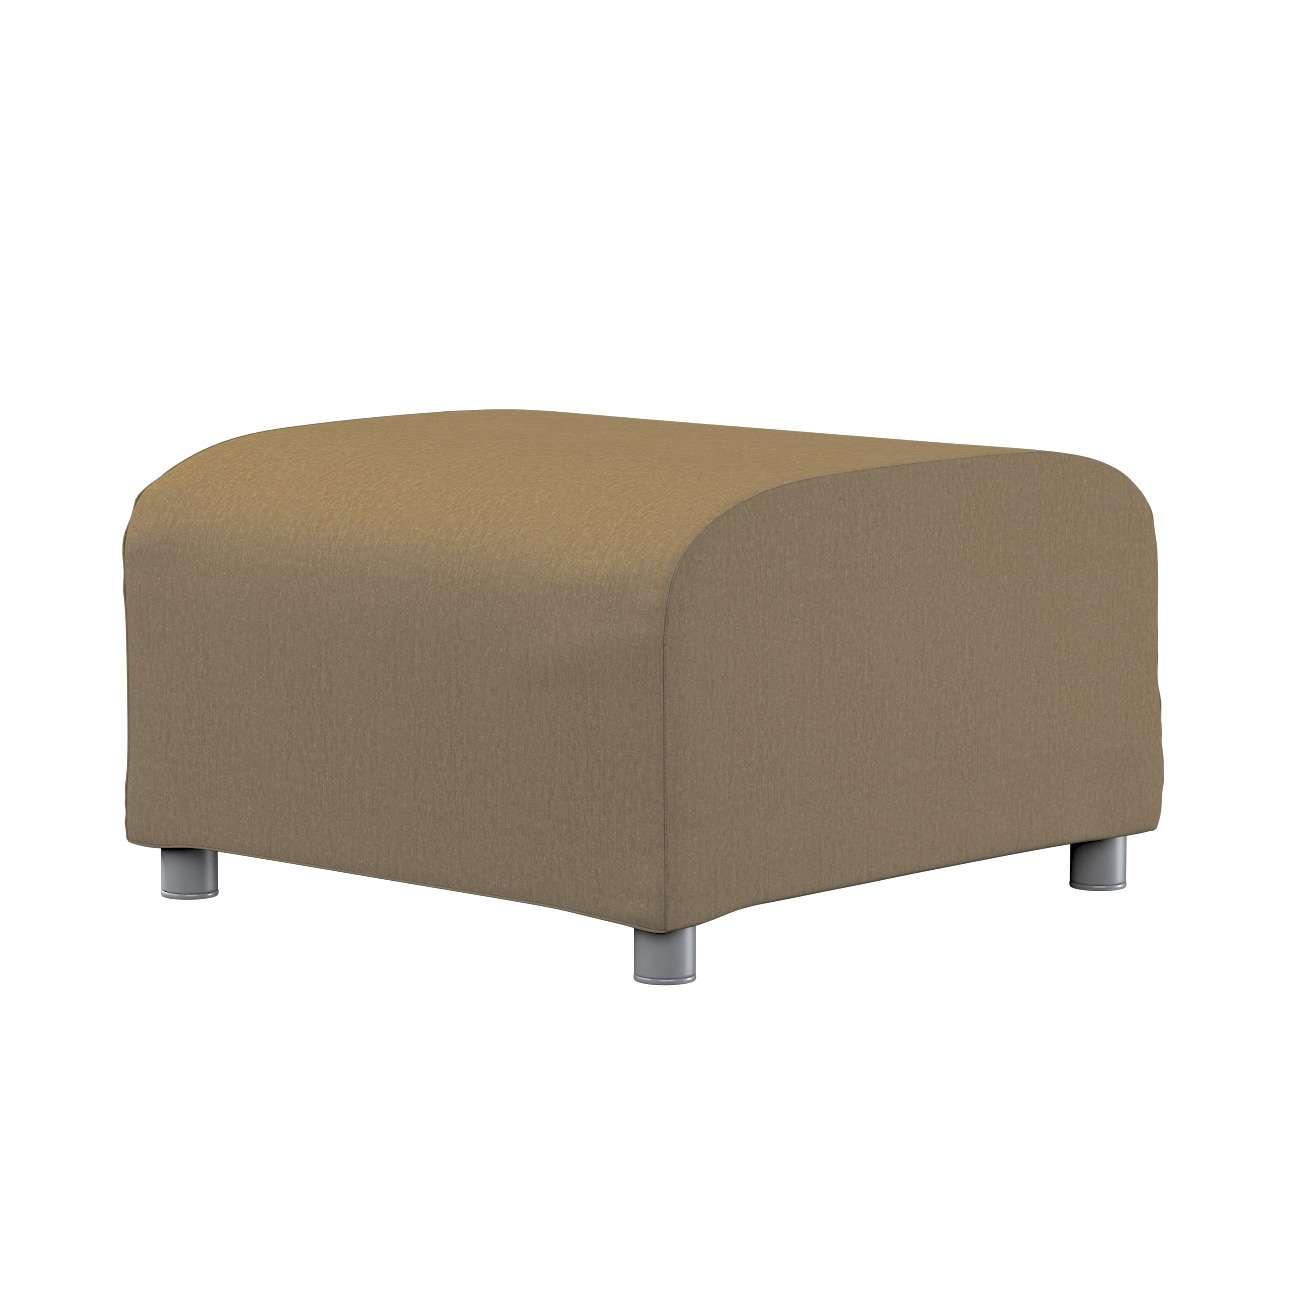 klippan hockerbezug caffe latte dekoria. Black Bedroom Furniture Sets. Home Design Ideas